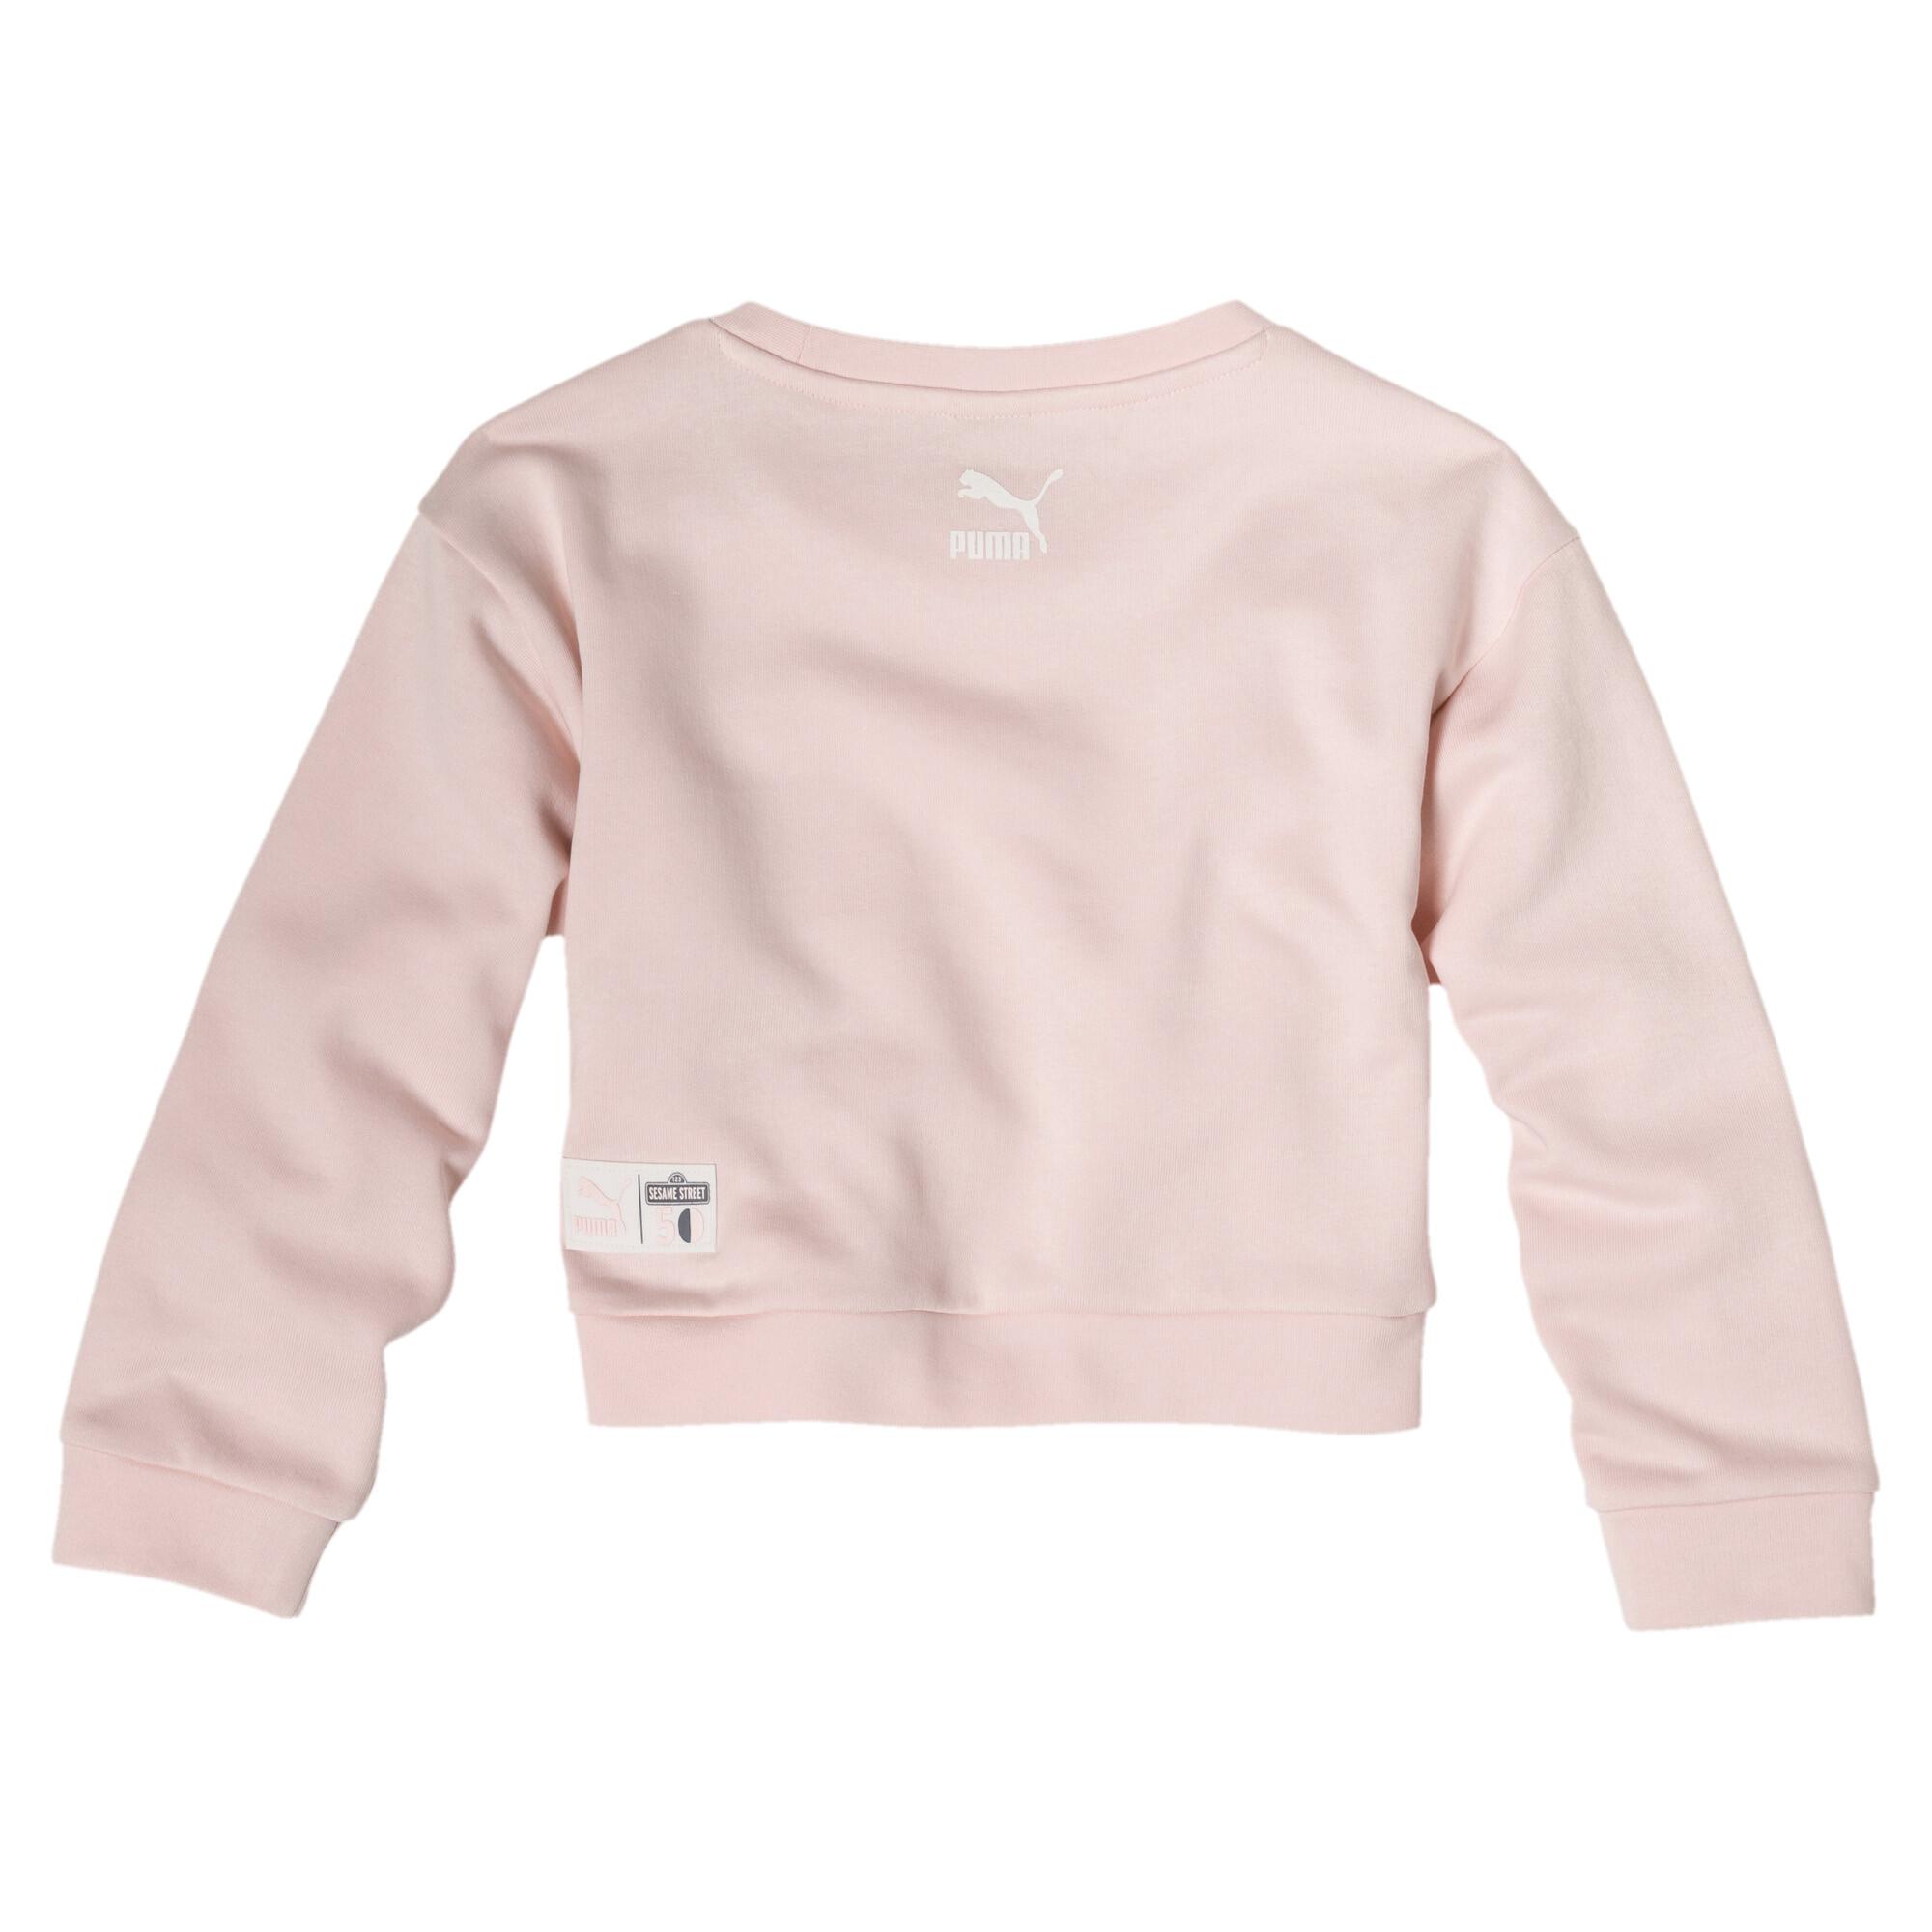 Image Puma PUMA x SESAME STREET Girl's Crewneck Sweatshirt INF #2